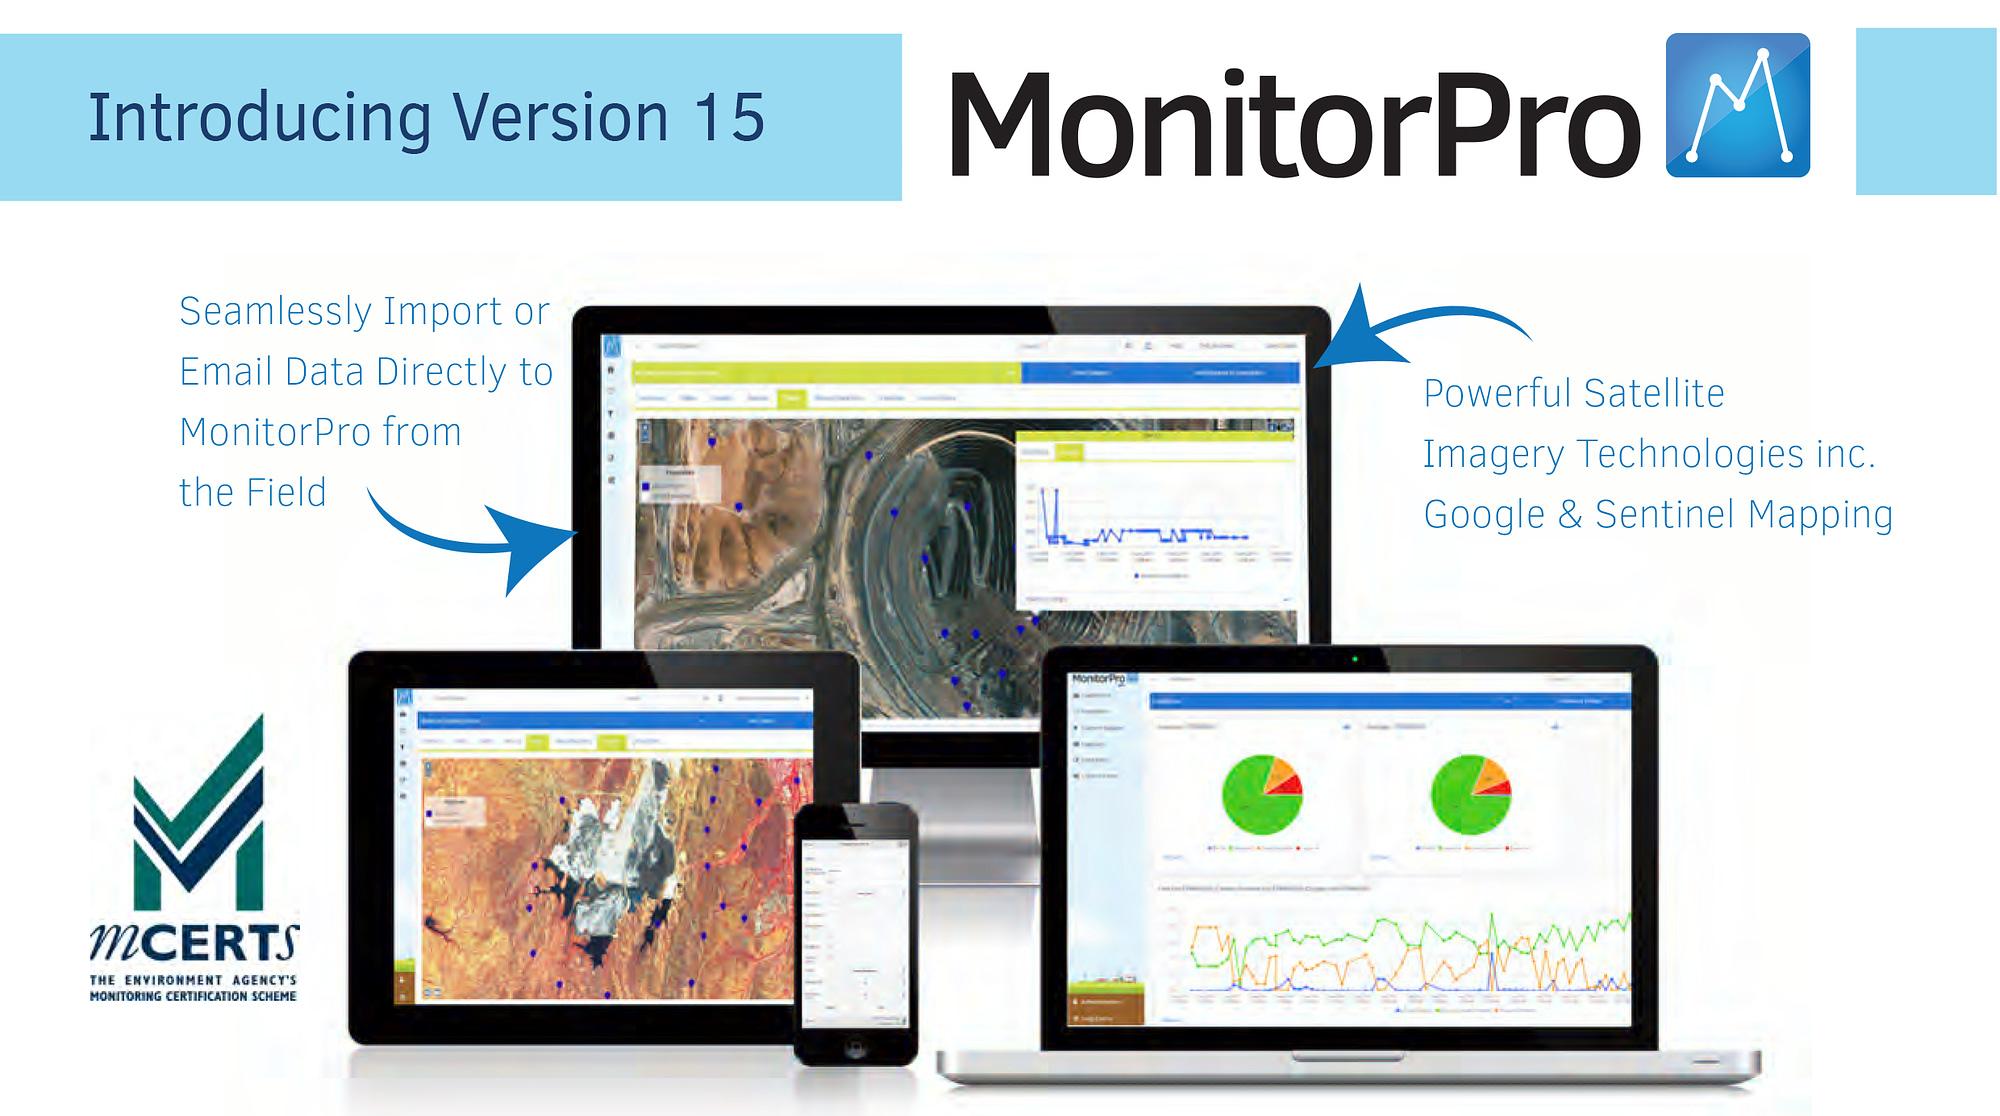 MonitorPro Version 15